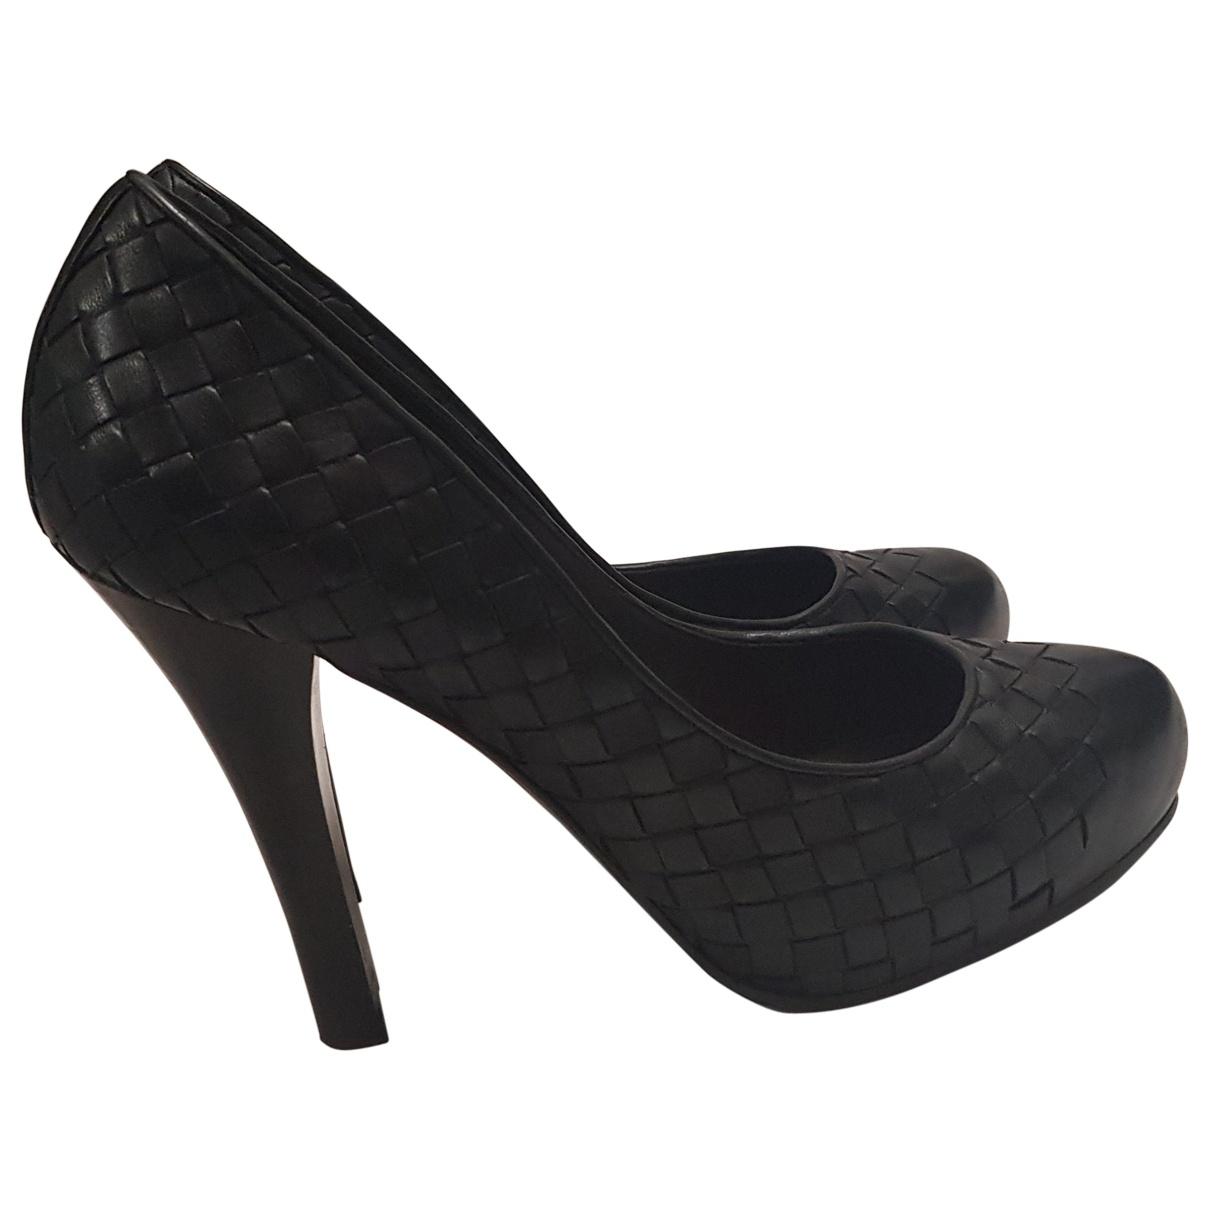 Bottega Veneta - Escarpins   pour femme en cuir - noir